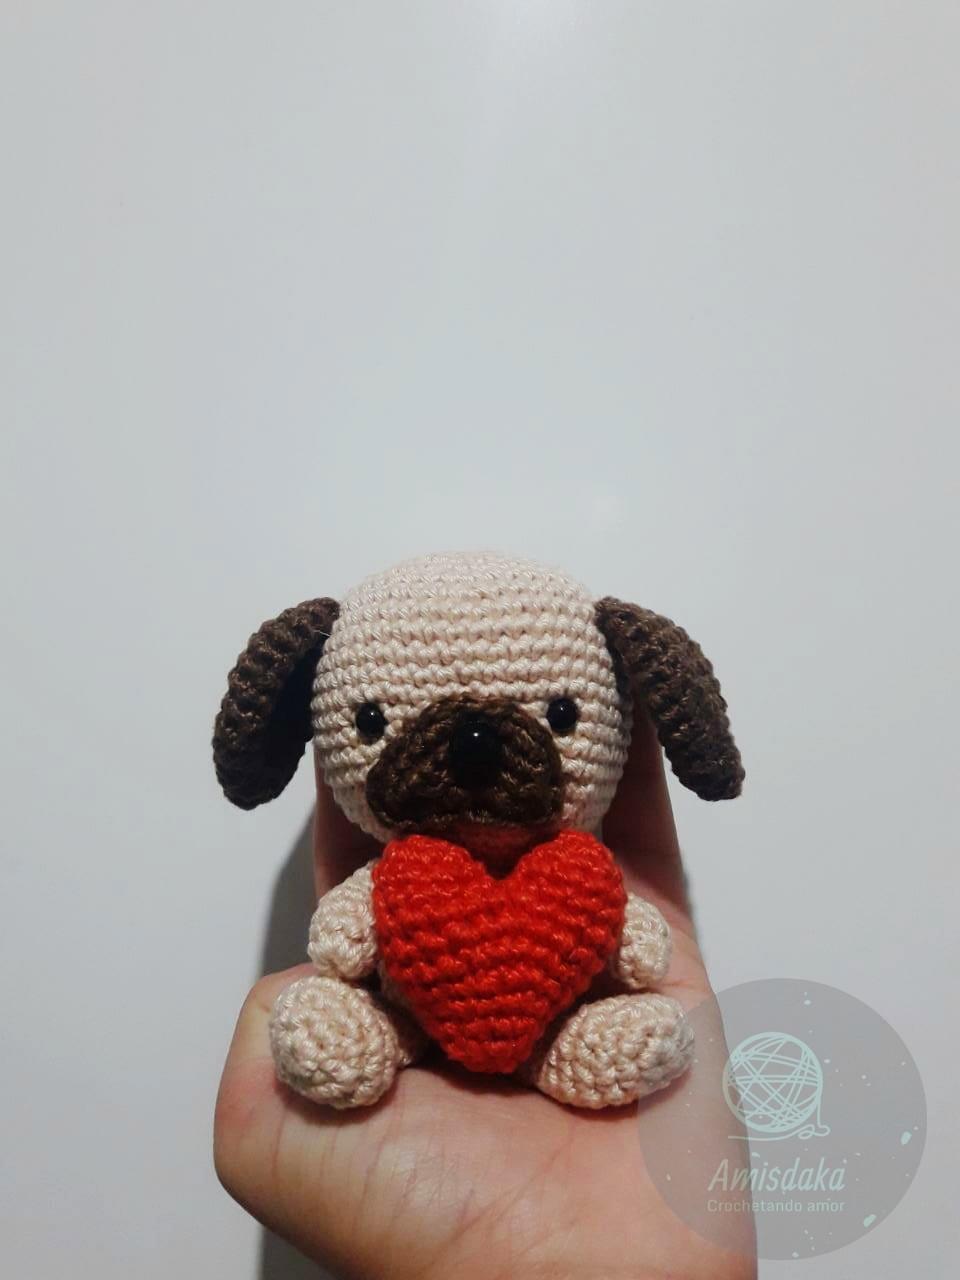 Crochet Adorable Pug Amigurumi Dog Part 1 of 2 DIY Tutorial - YouTube | 1280x960